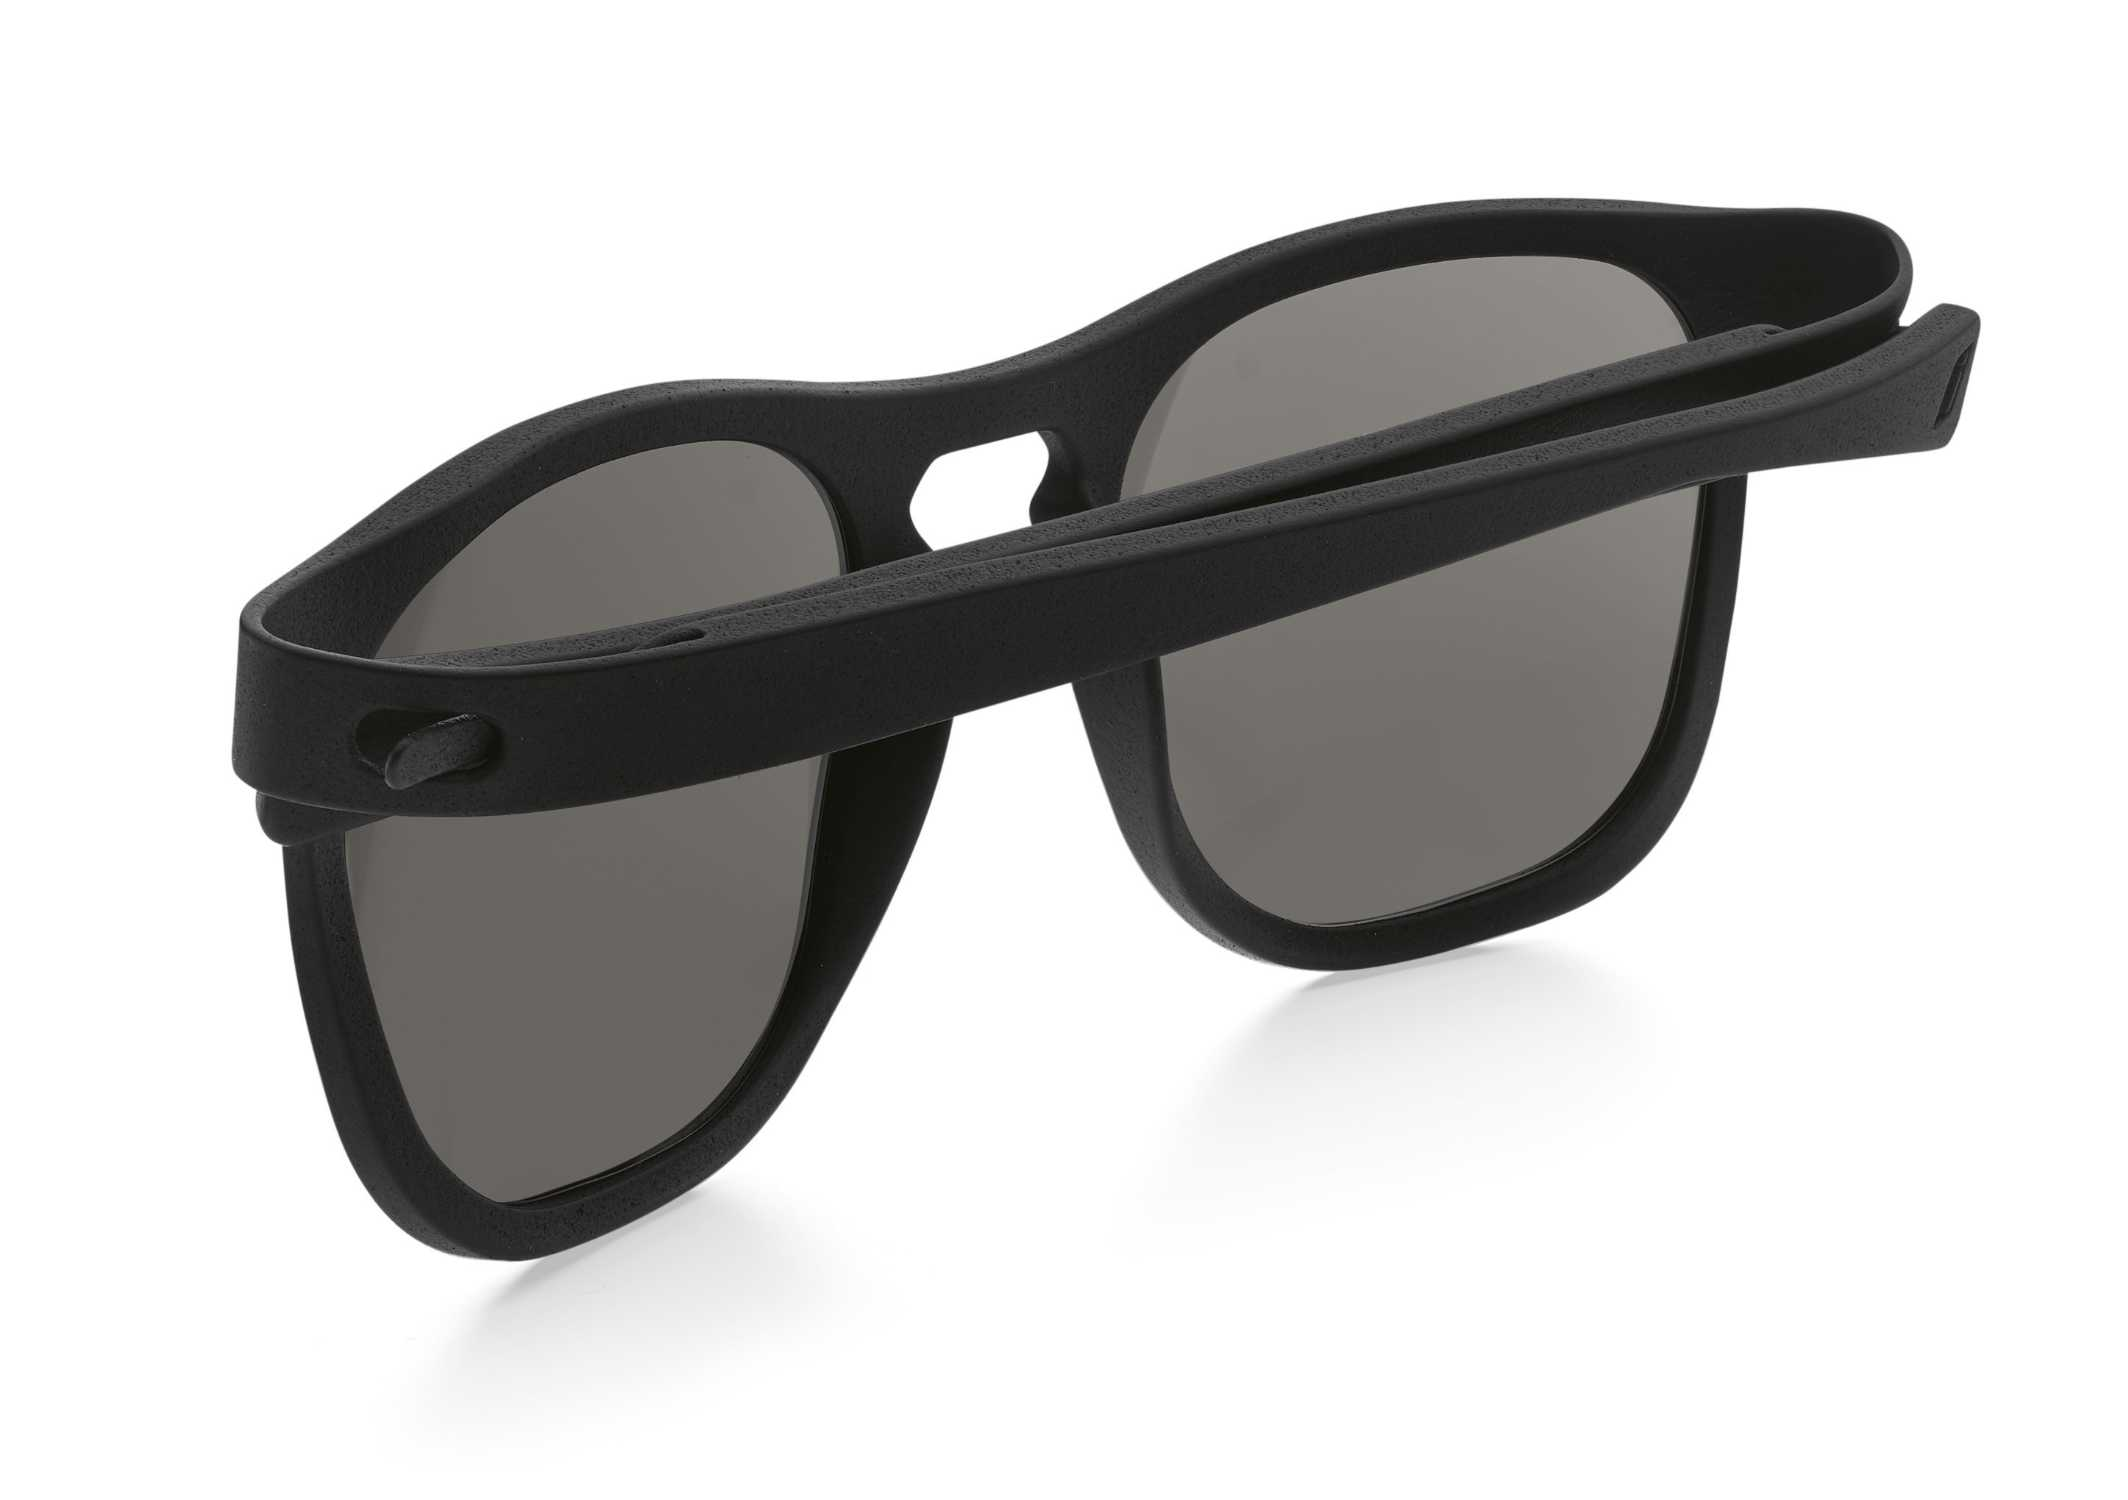 photography up auto vehicle bmw leaf green sunglasses mask logo the images macro close photo car en free